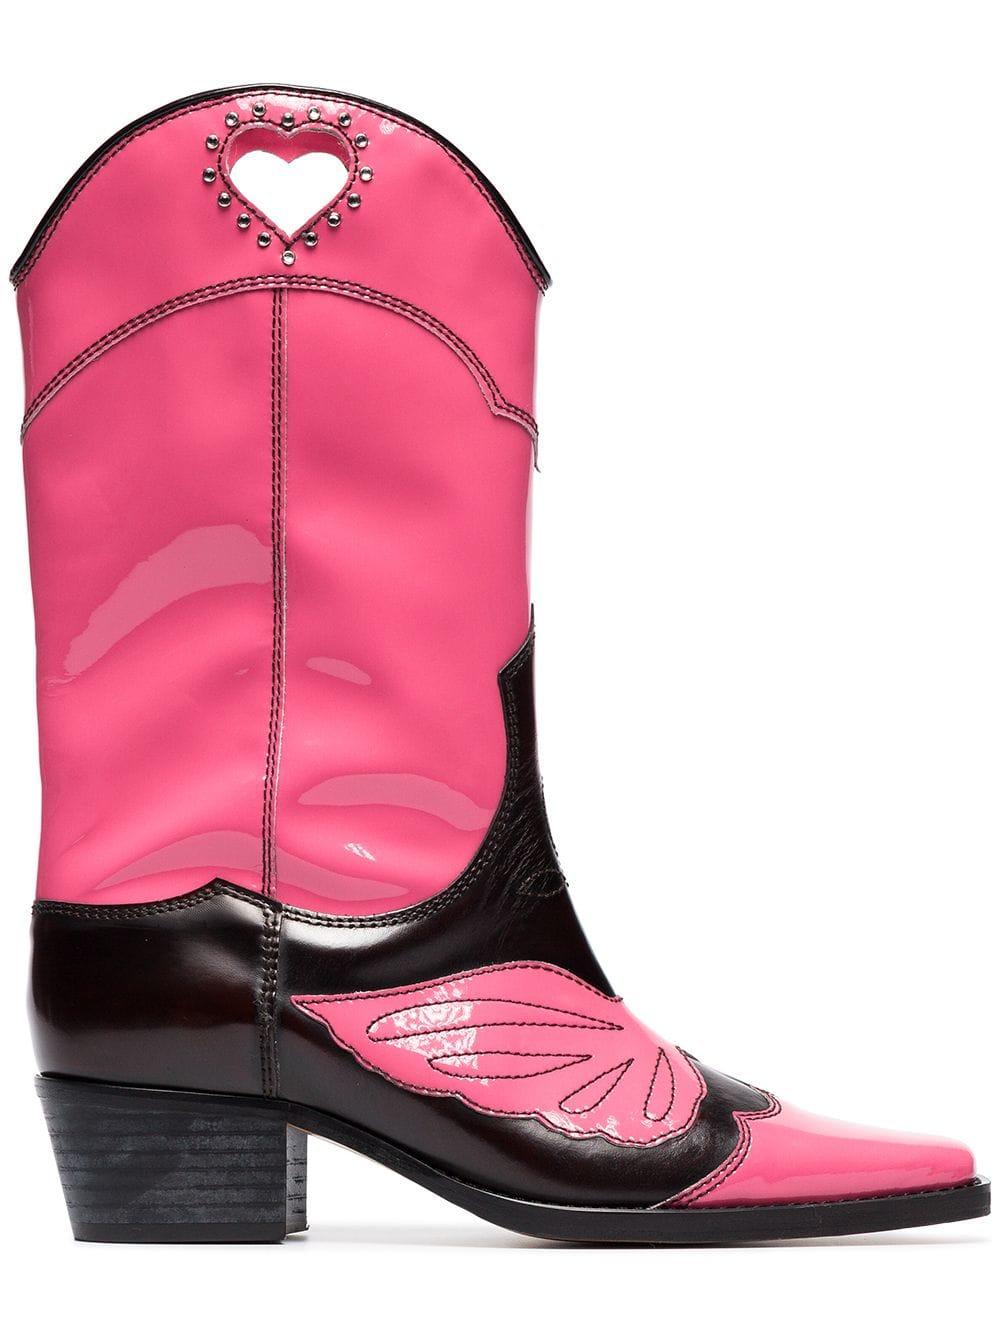 422b299a697 Marlyn 45 Leather Cowboy Boots